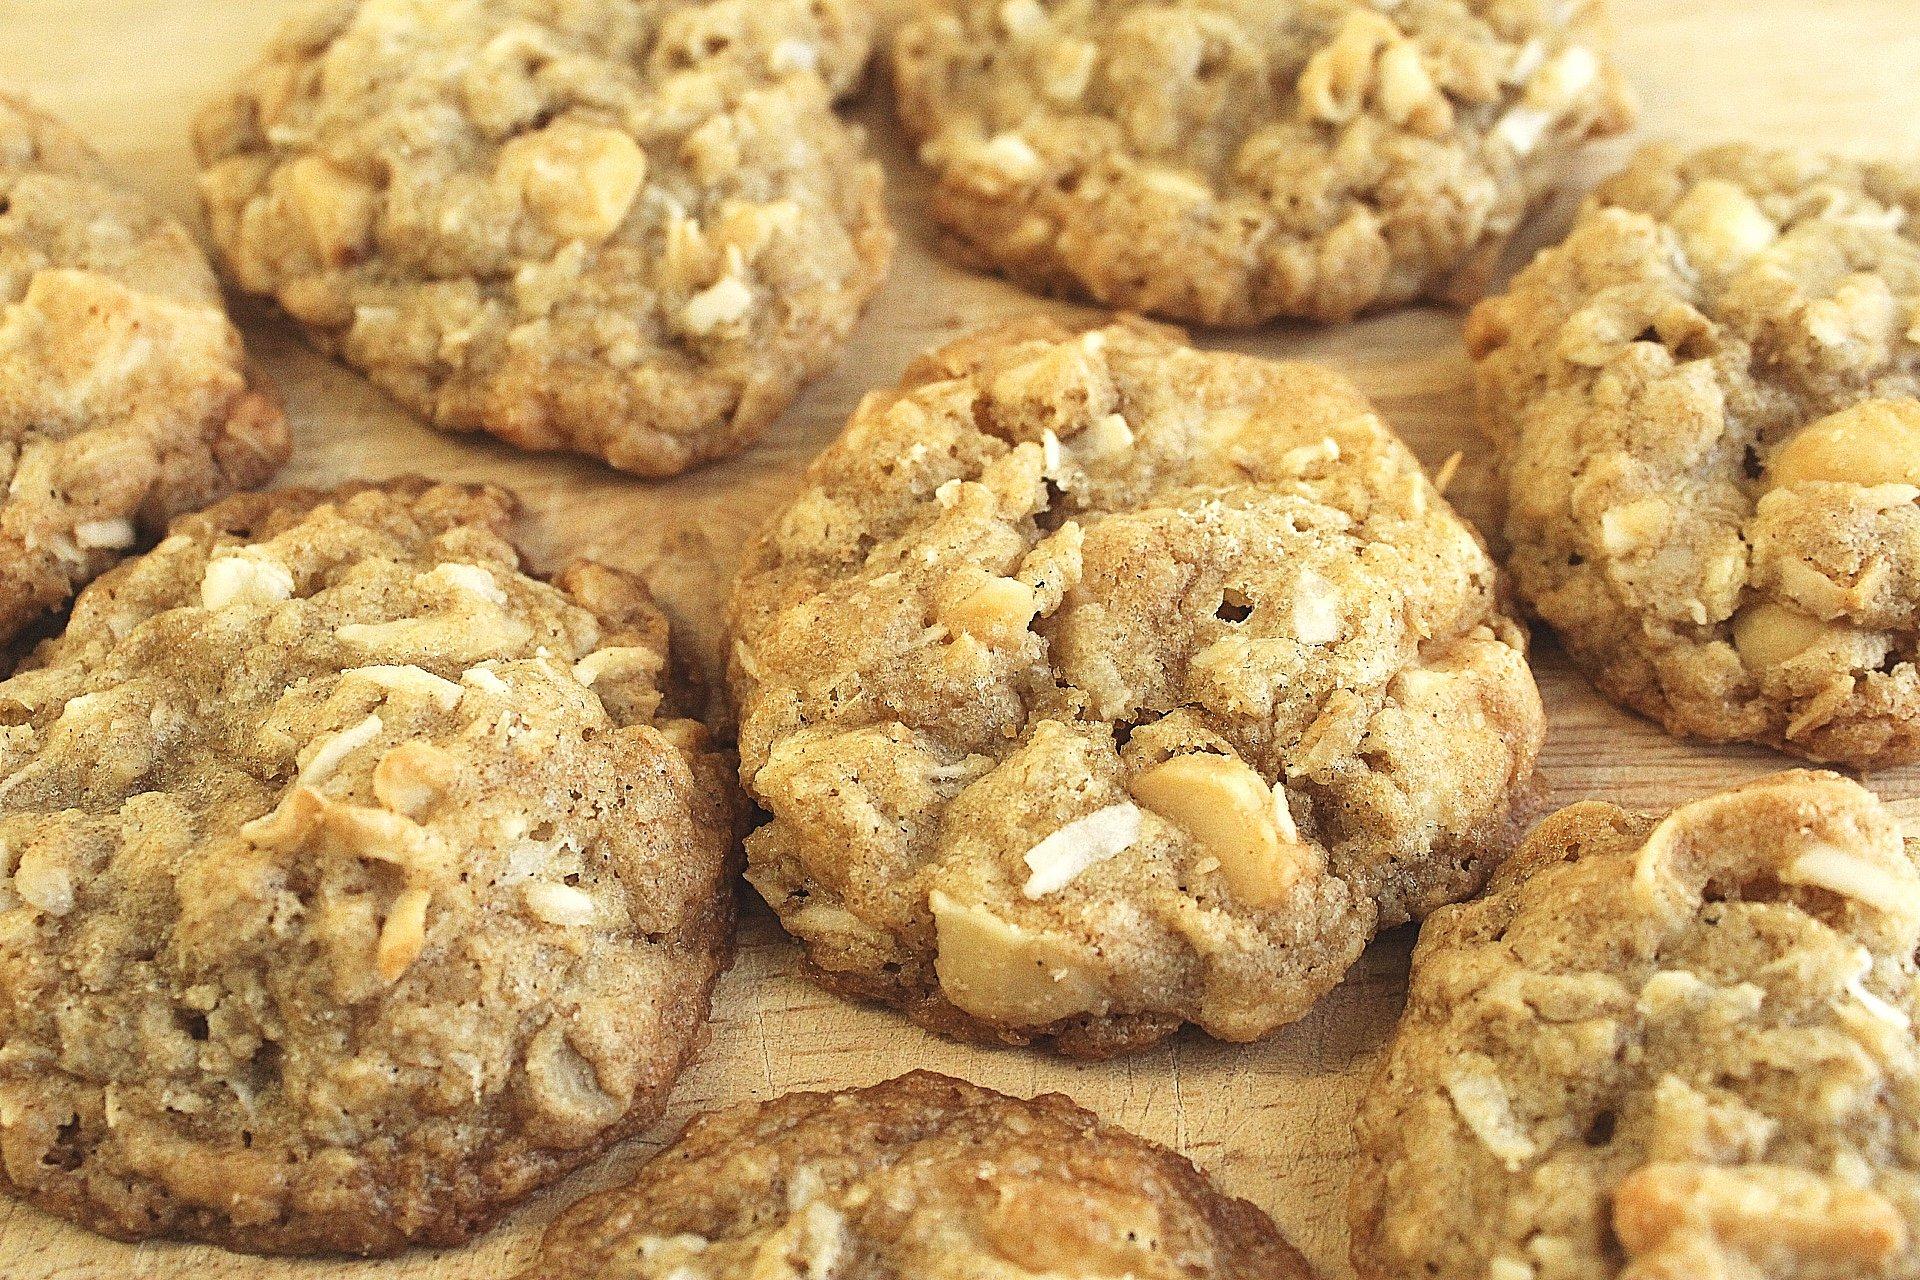 Coconut Macadamia Oatmeal Cookies with White Chocolate Chunks